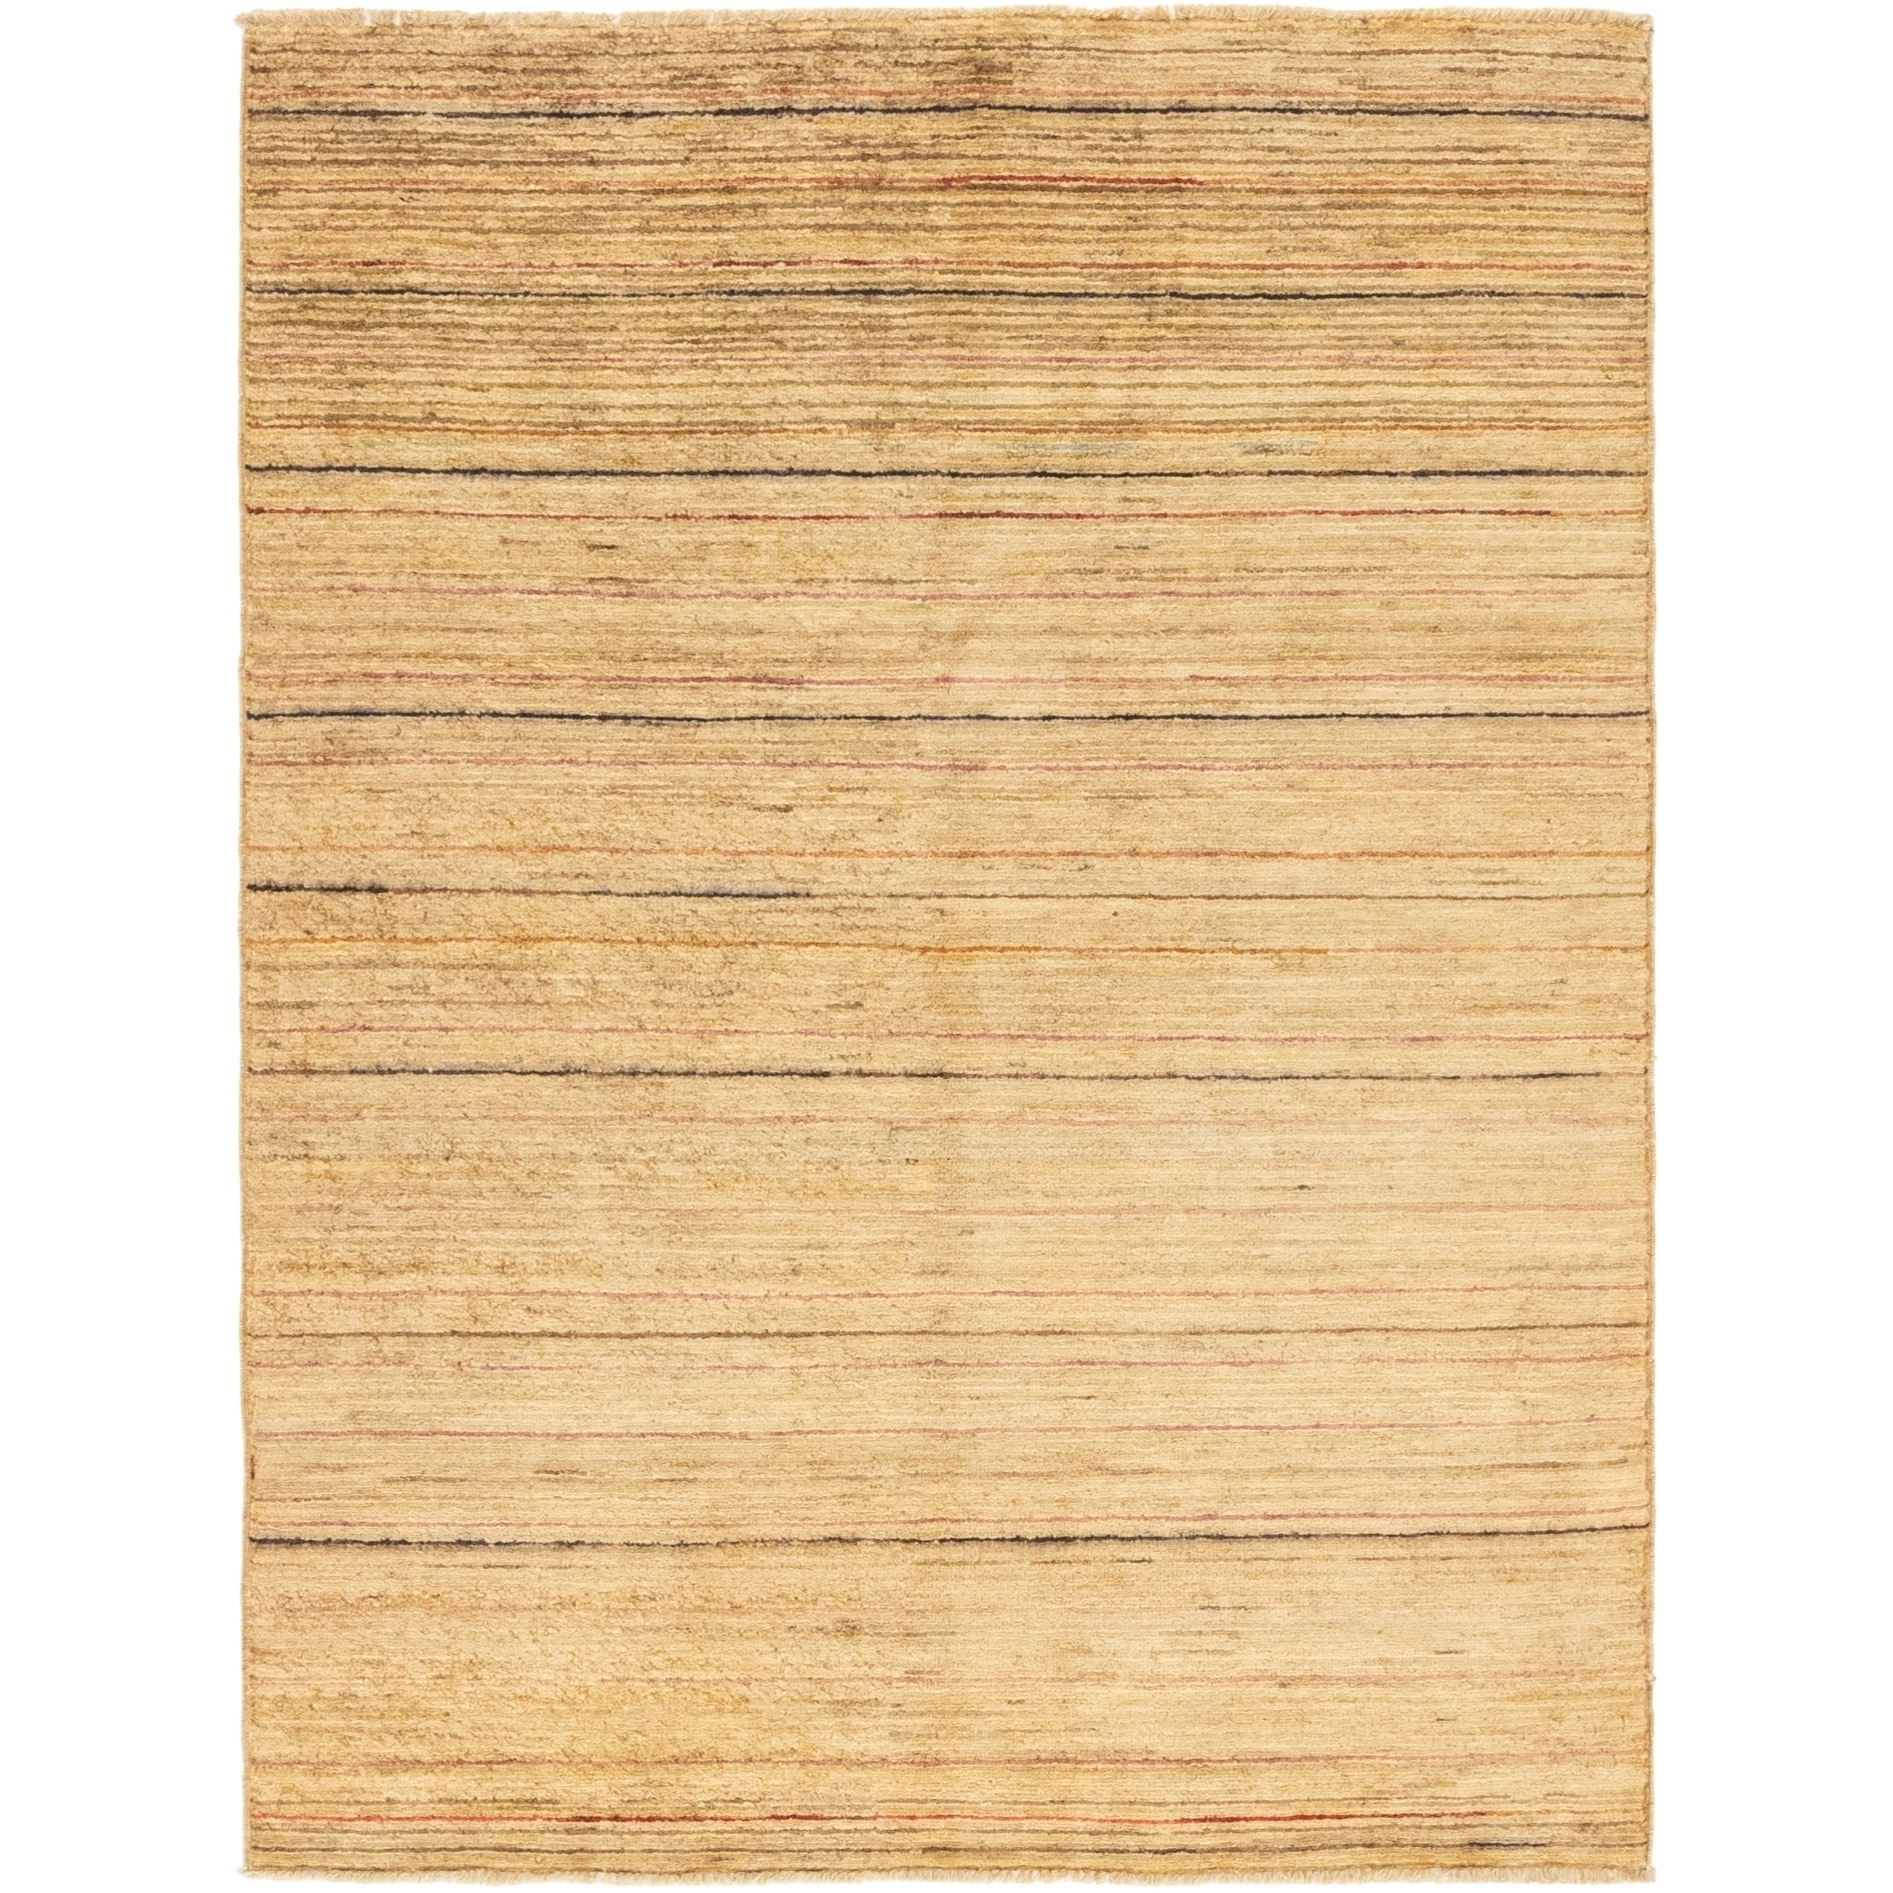 Hand Knotted Kashkuli Gabbeh Wool Area Rug - 4 7 x 6 1 (Beige - 4 7 x 6 1)